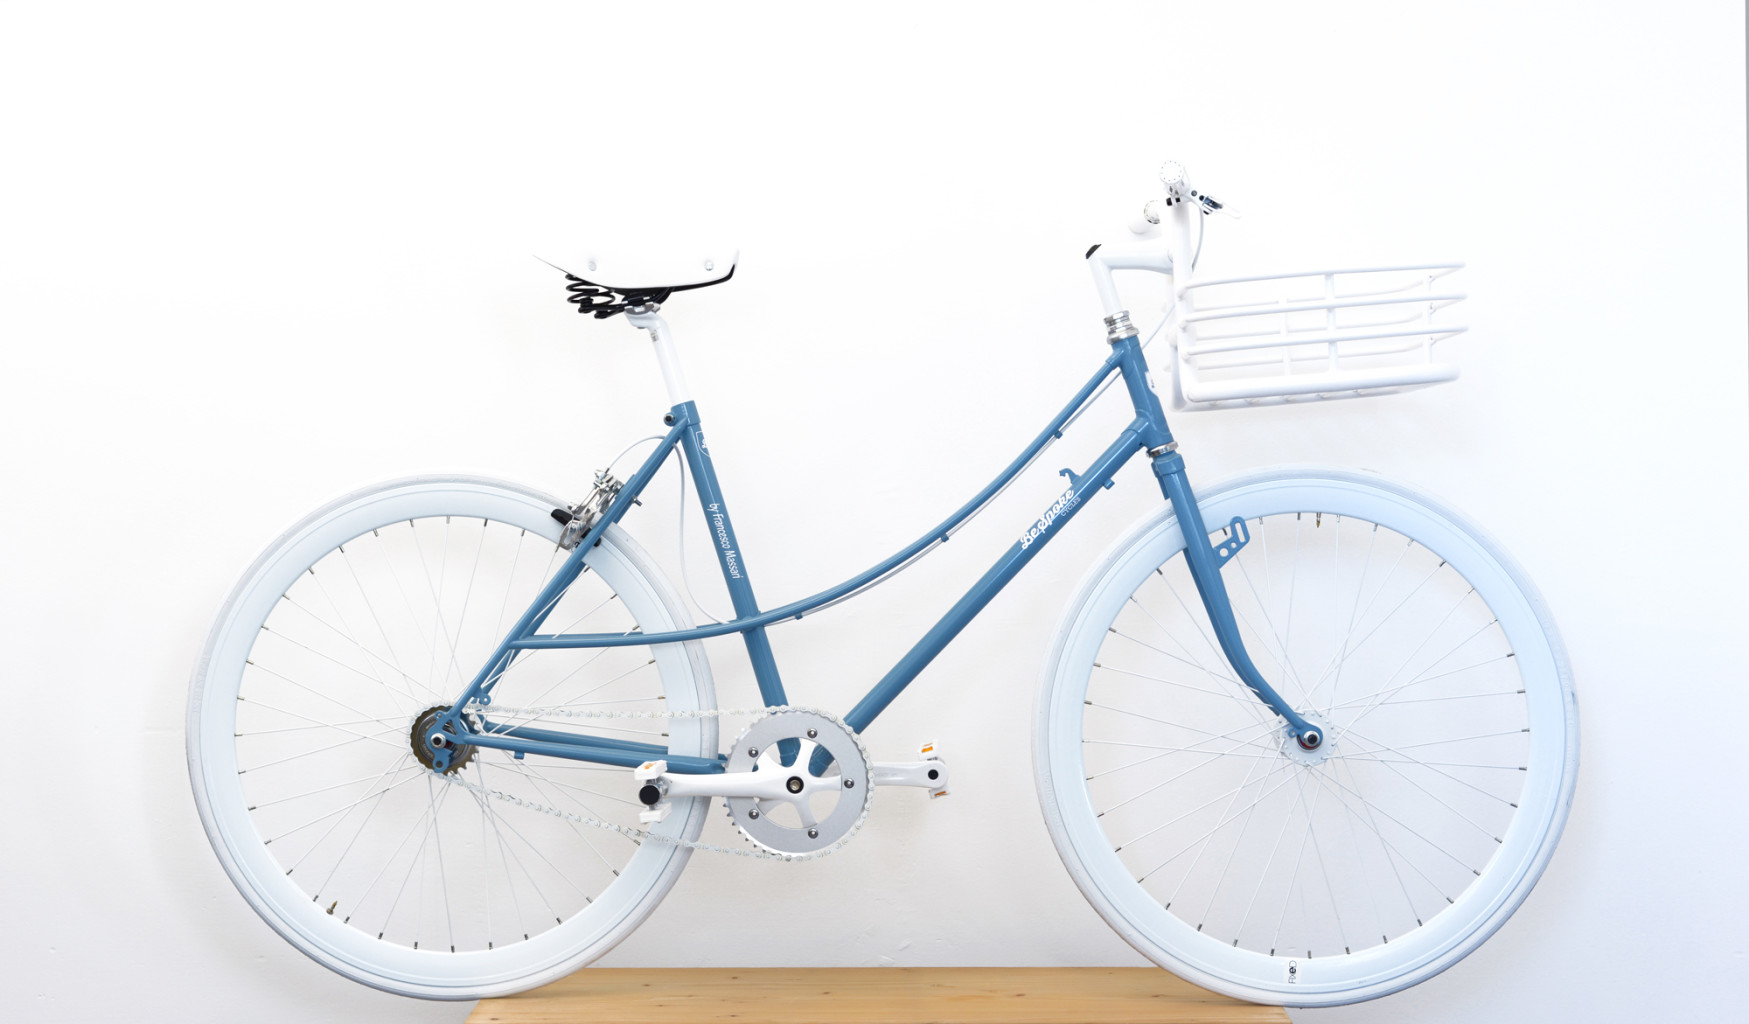 Bespoke bike 3